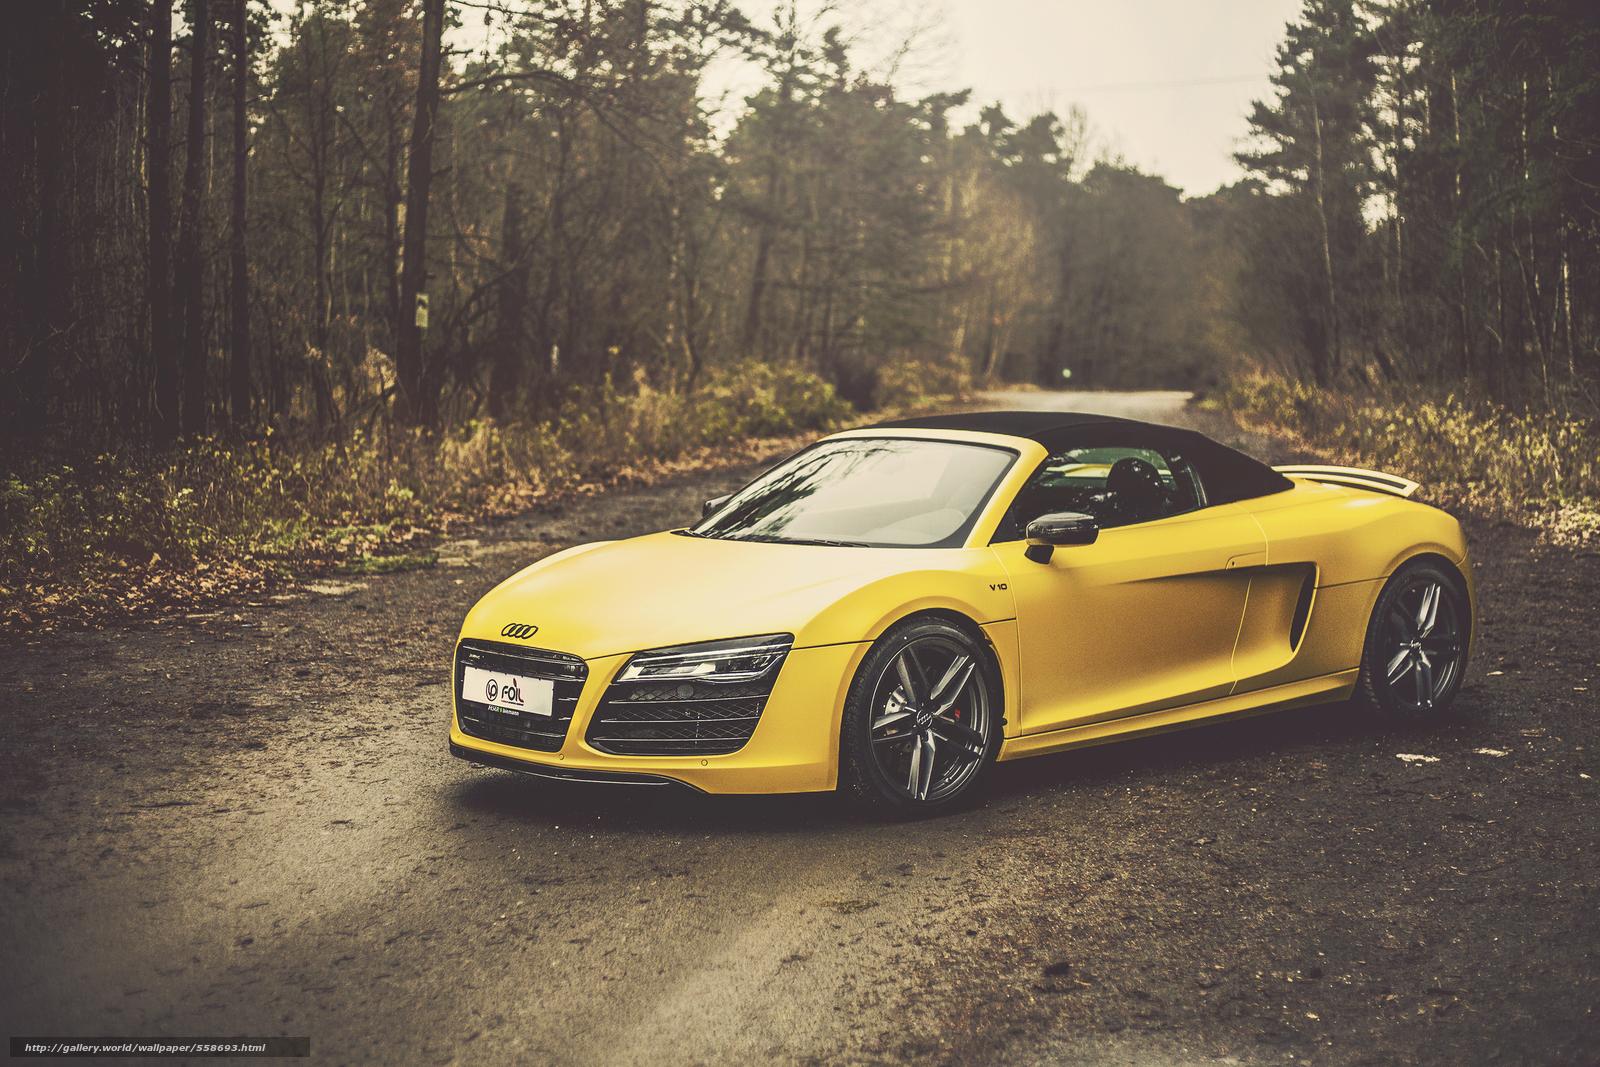 Audi r8 v10 lms ultra csr 5